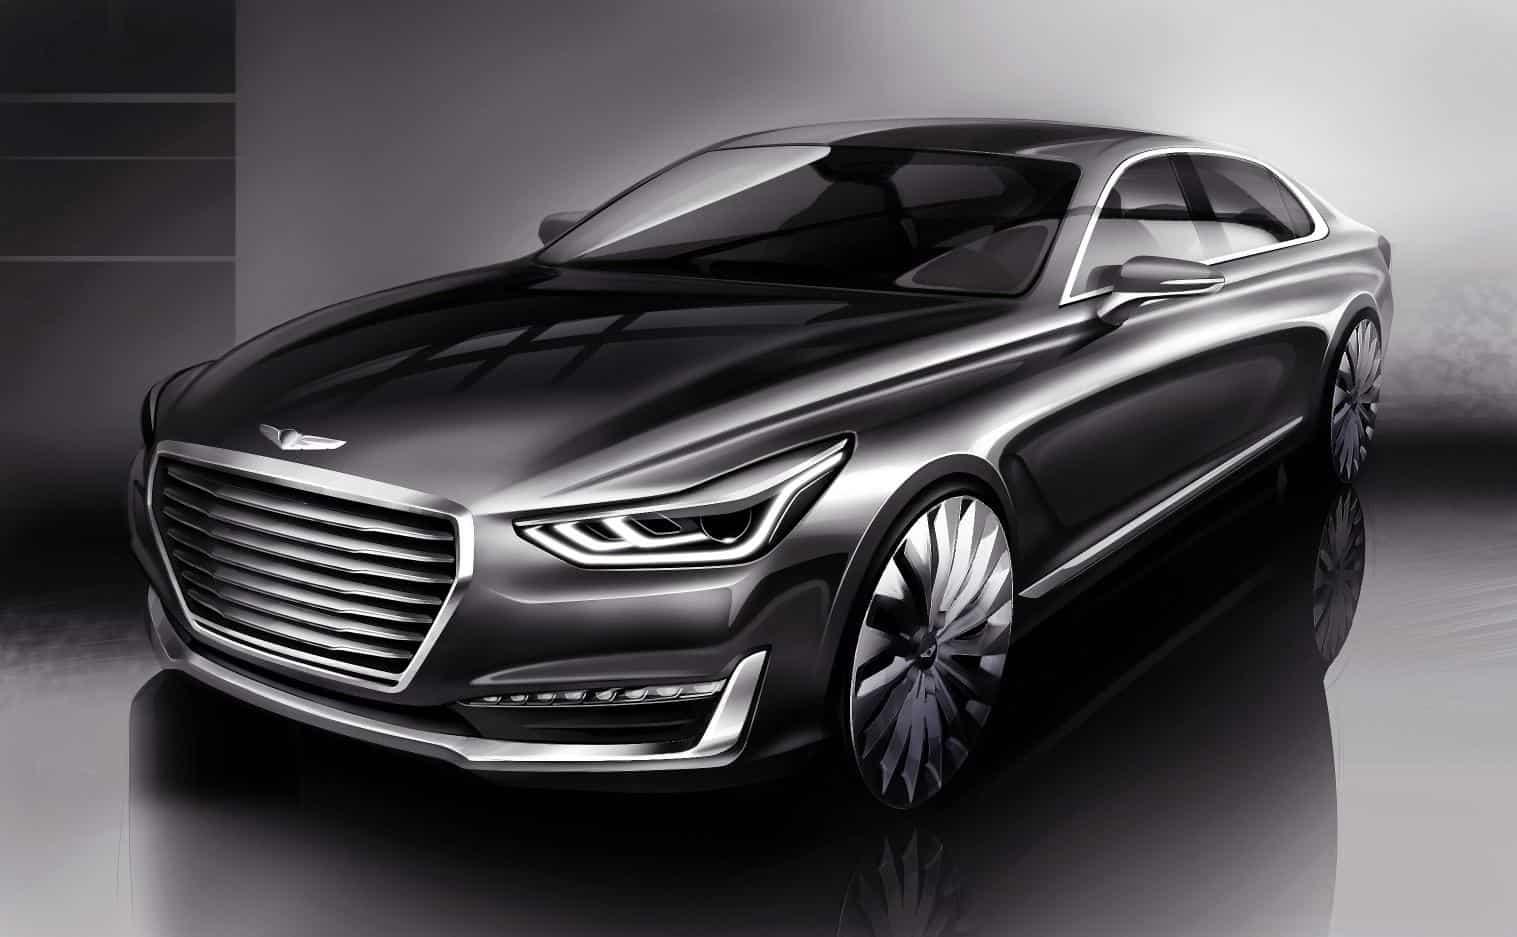 Top 10 Car Companies That We Expect Will Fail - Genesis